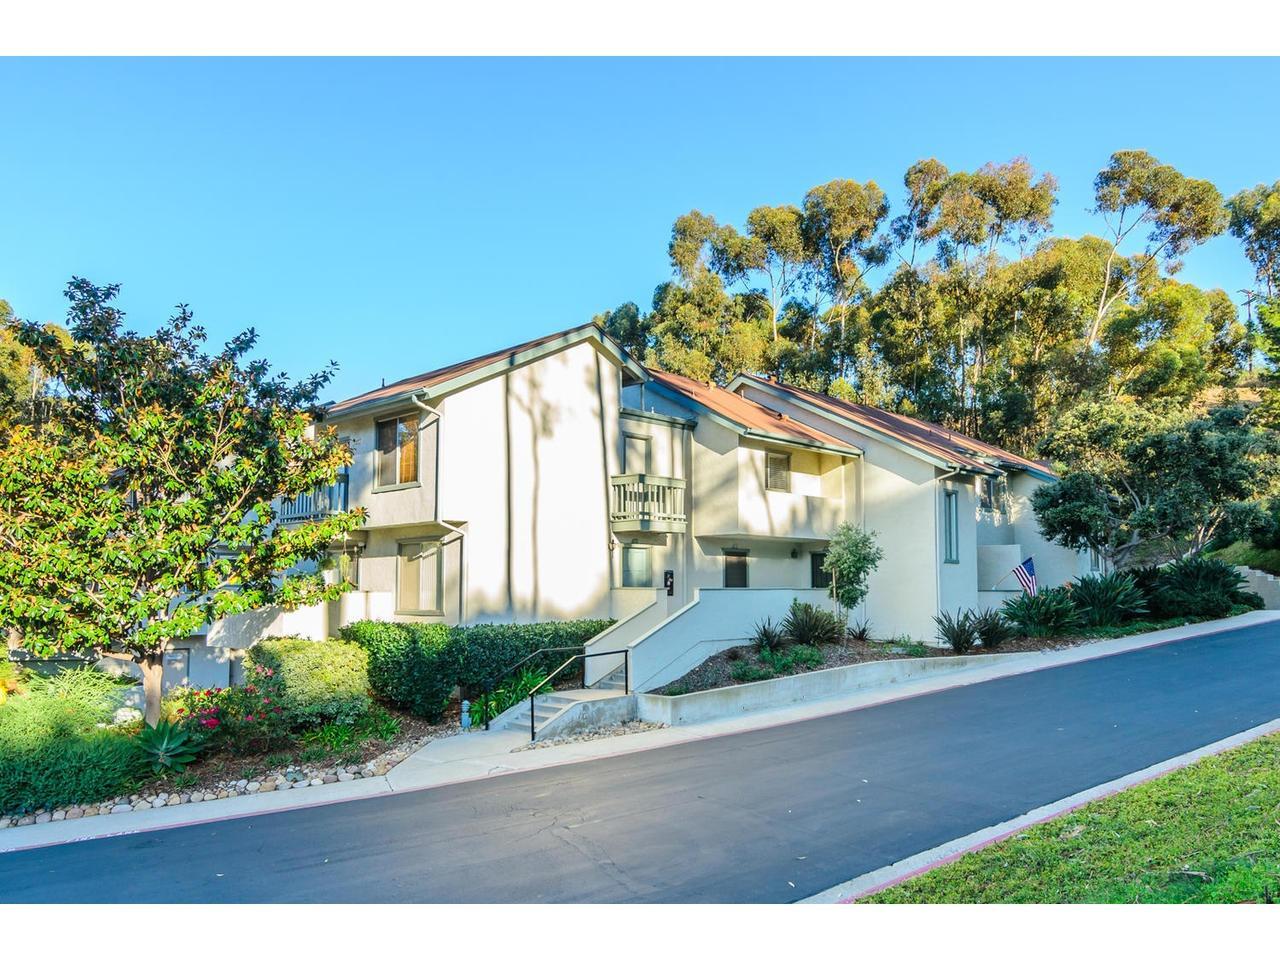 7049 Park Mesa Way #88, San Diego, CA 92111 - Estimate and Home ...